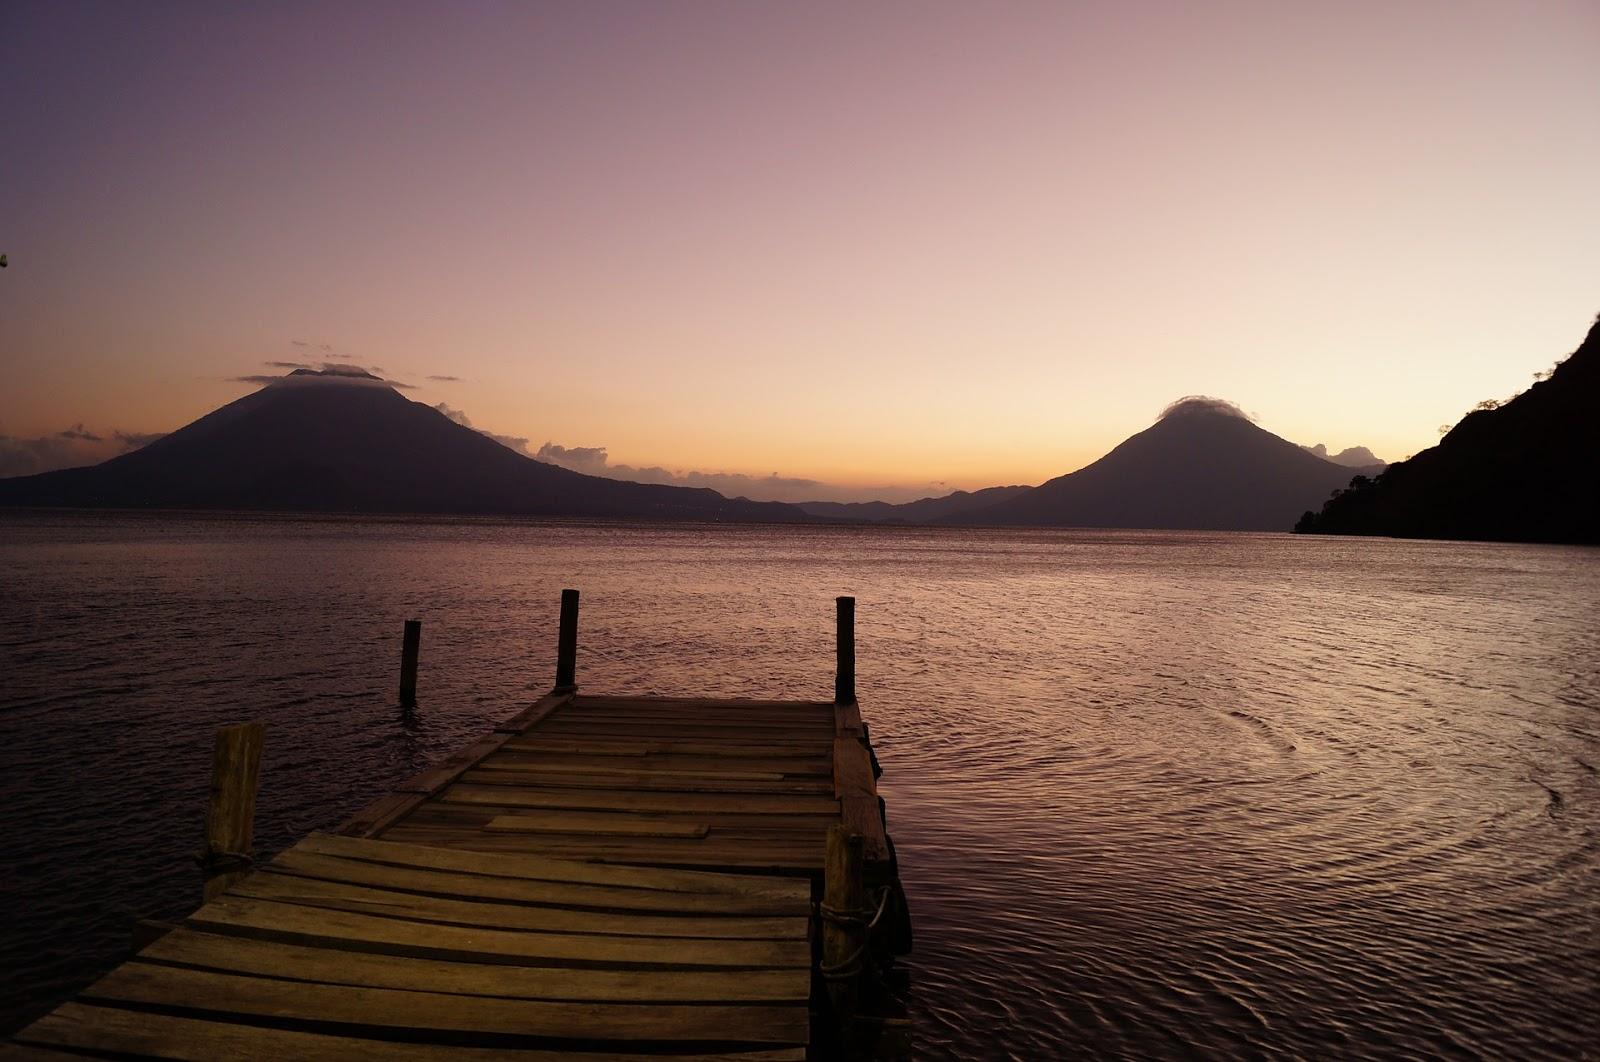 Victor School's Guatemalan Journey